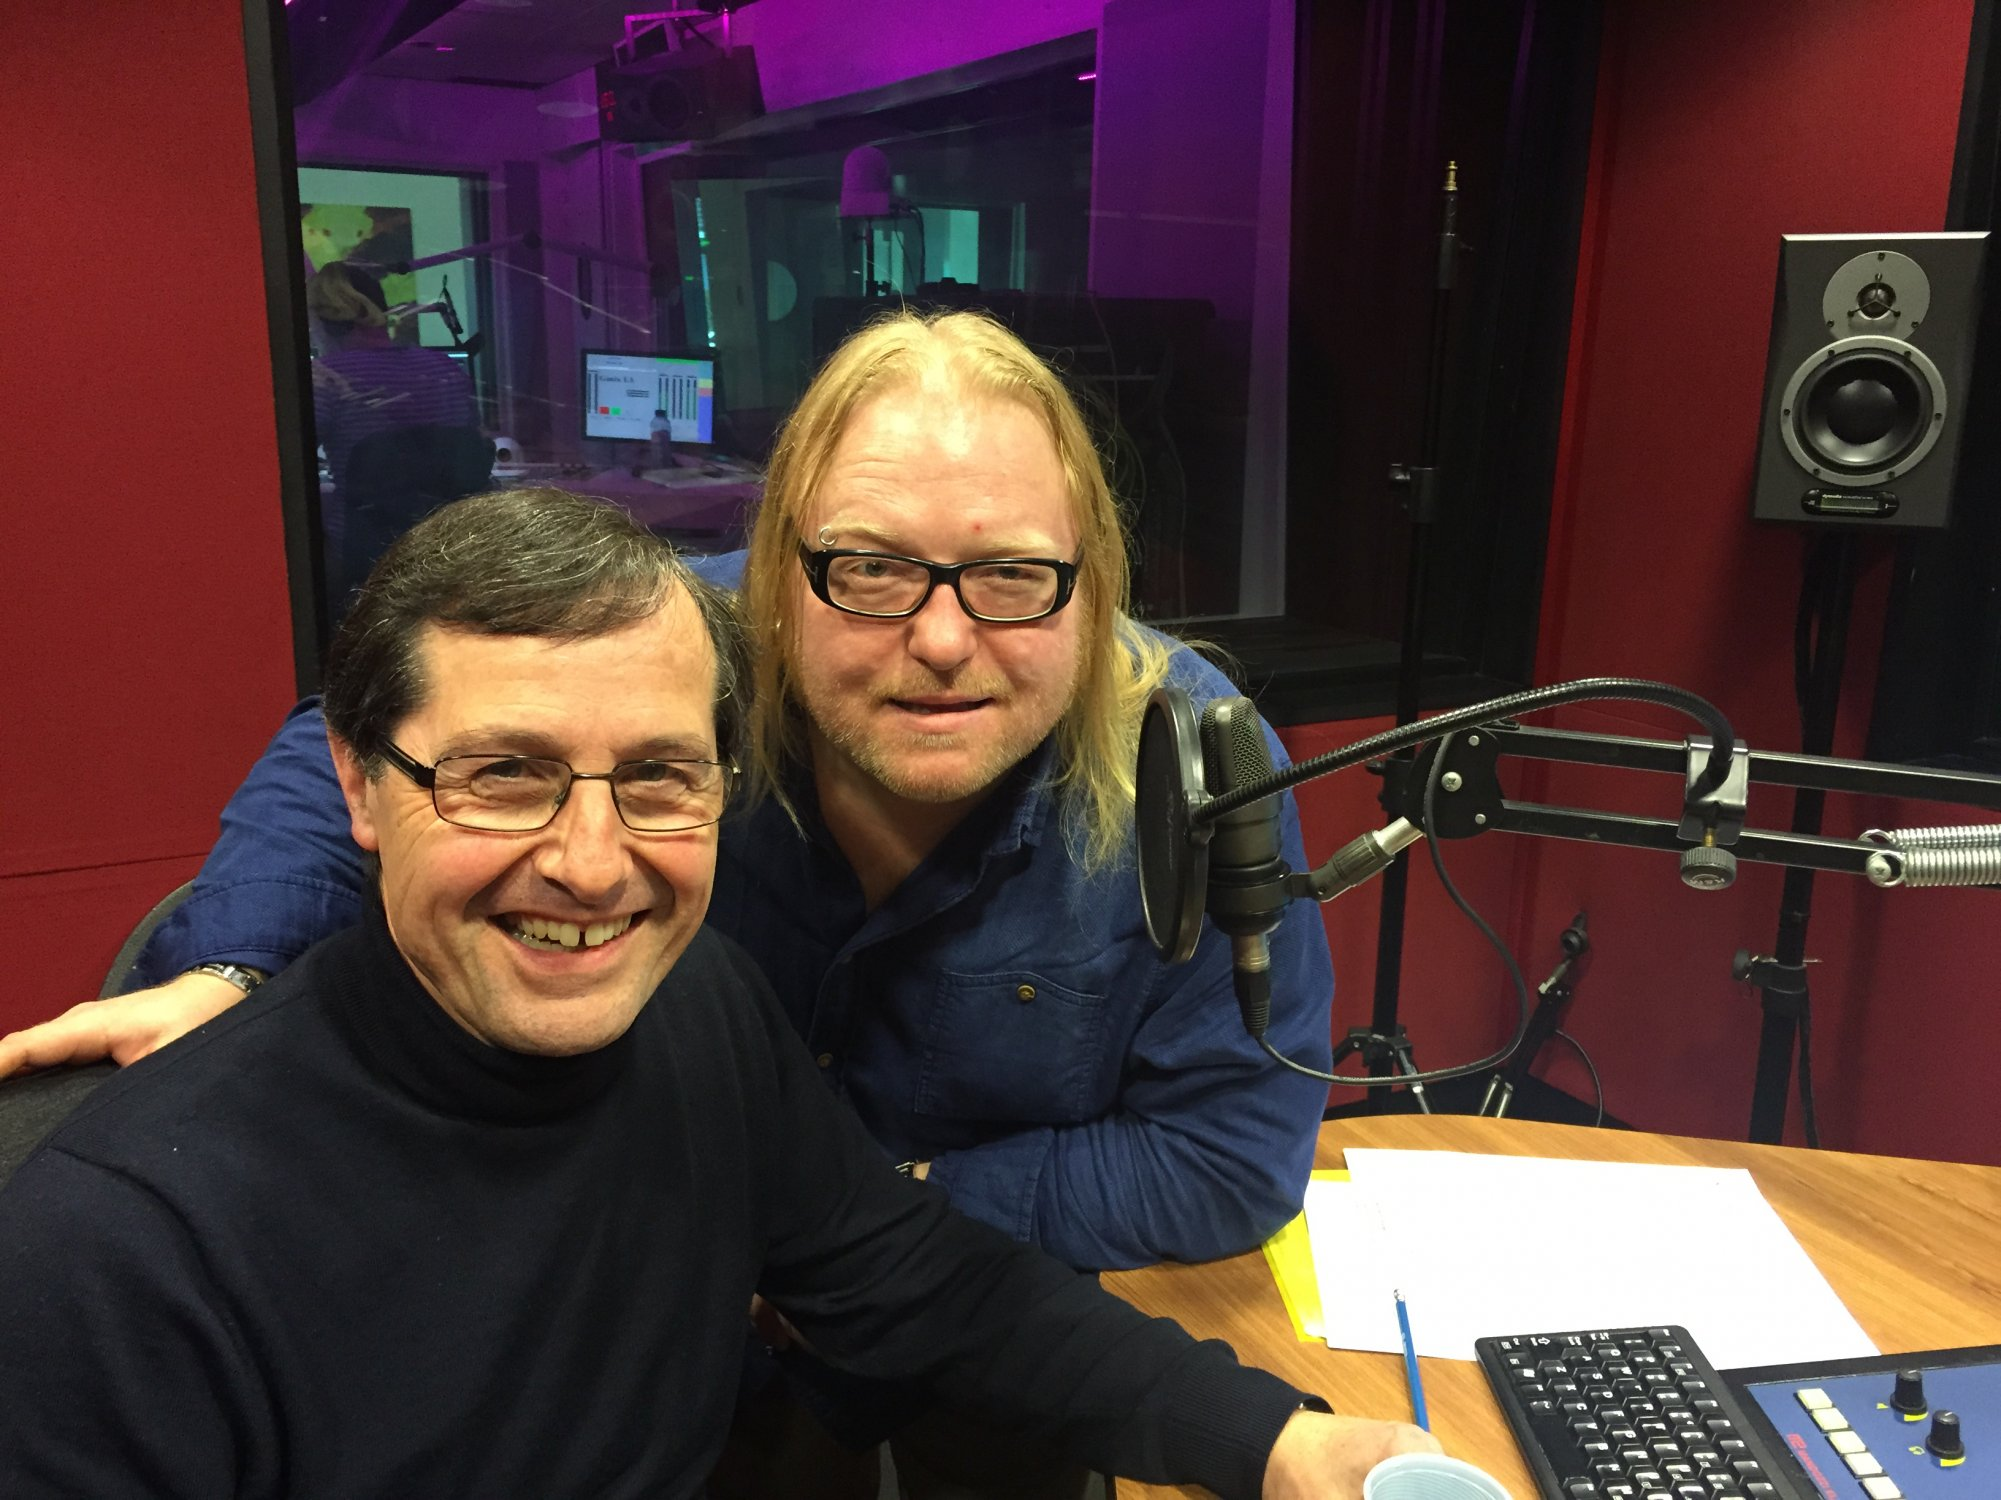 Ludo Claesen is de Klassieke Gast van L1 Radio - L1